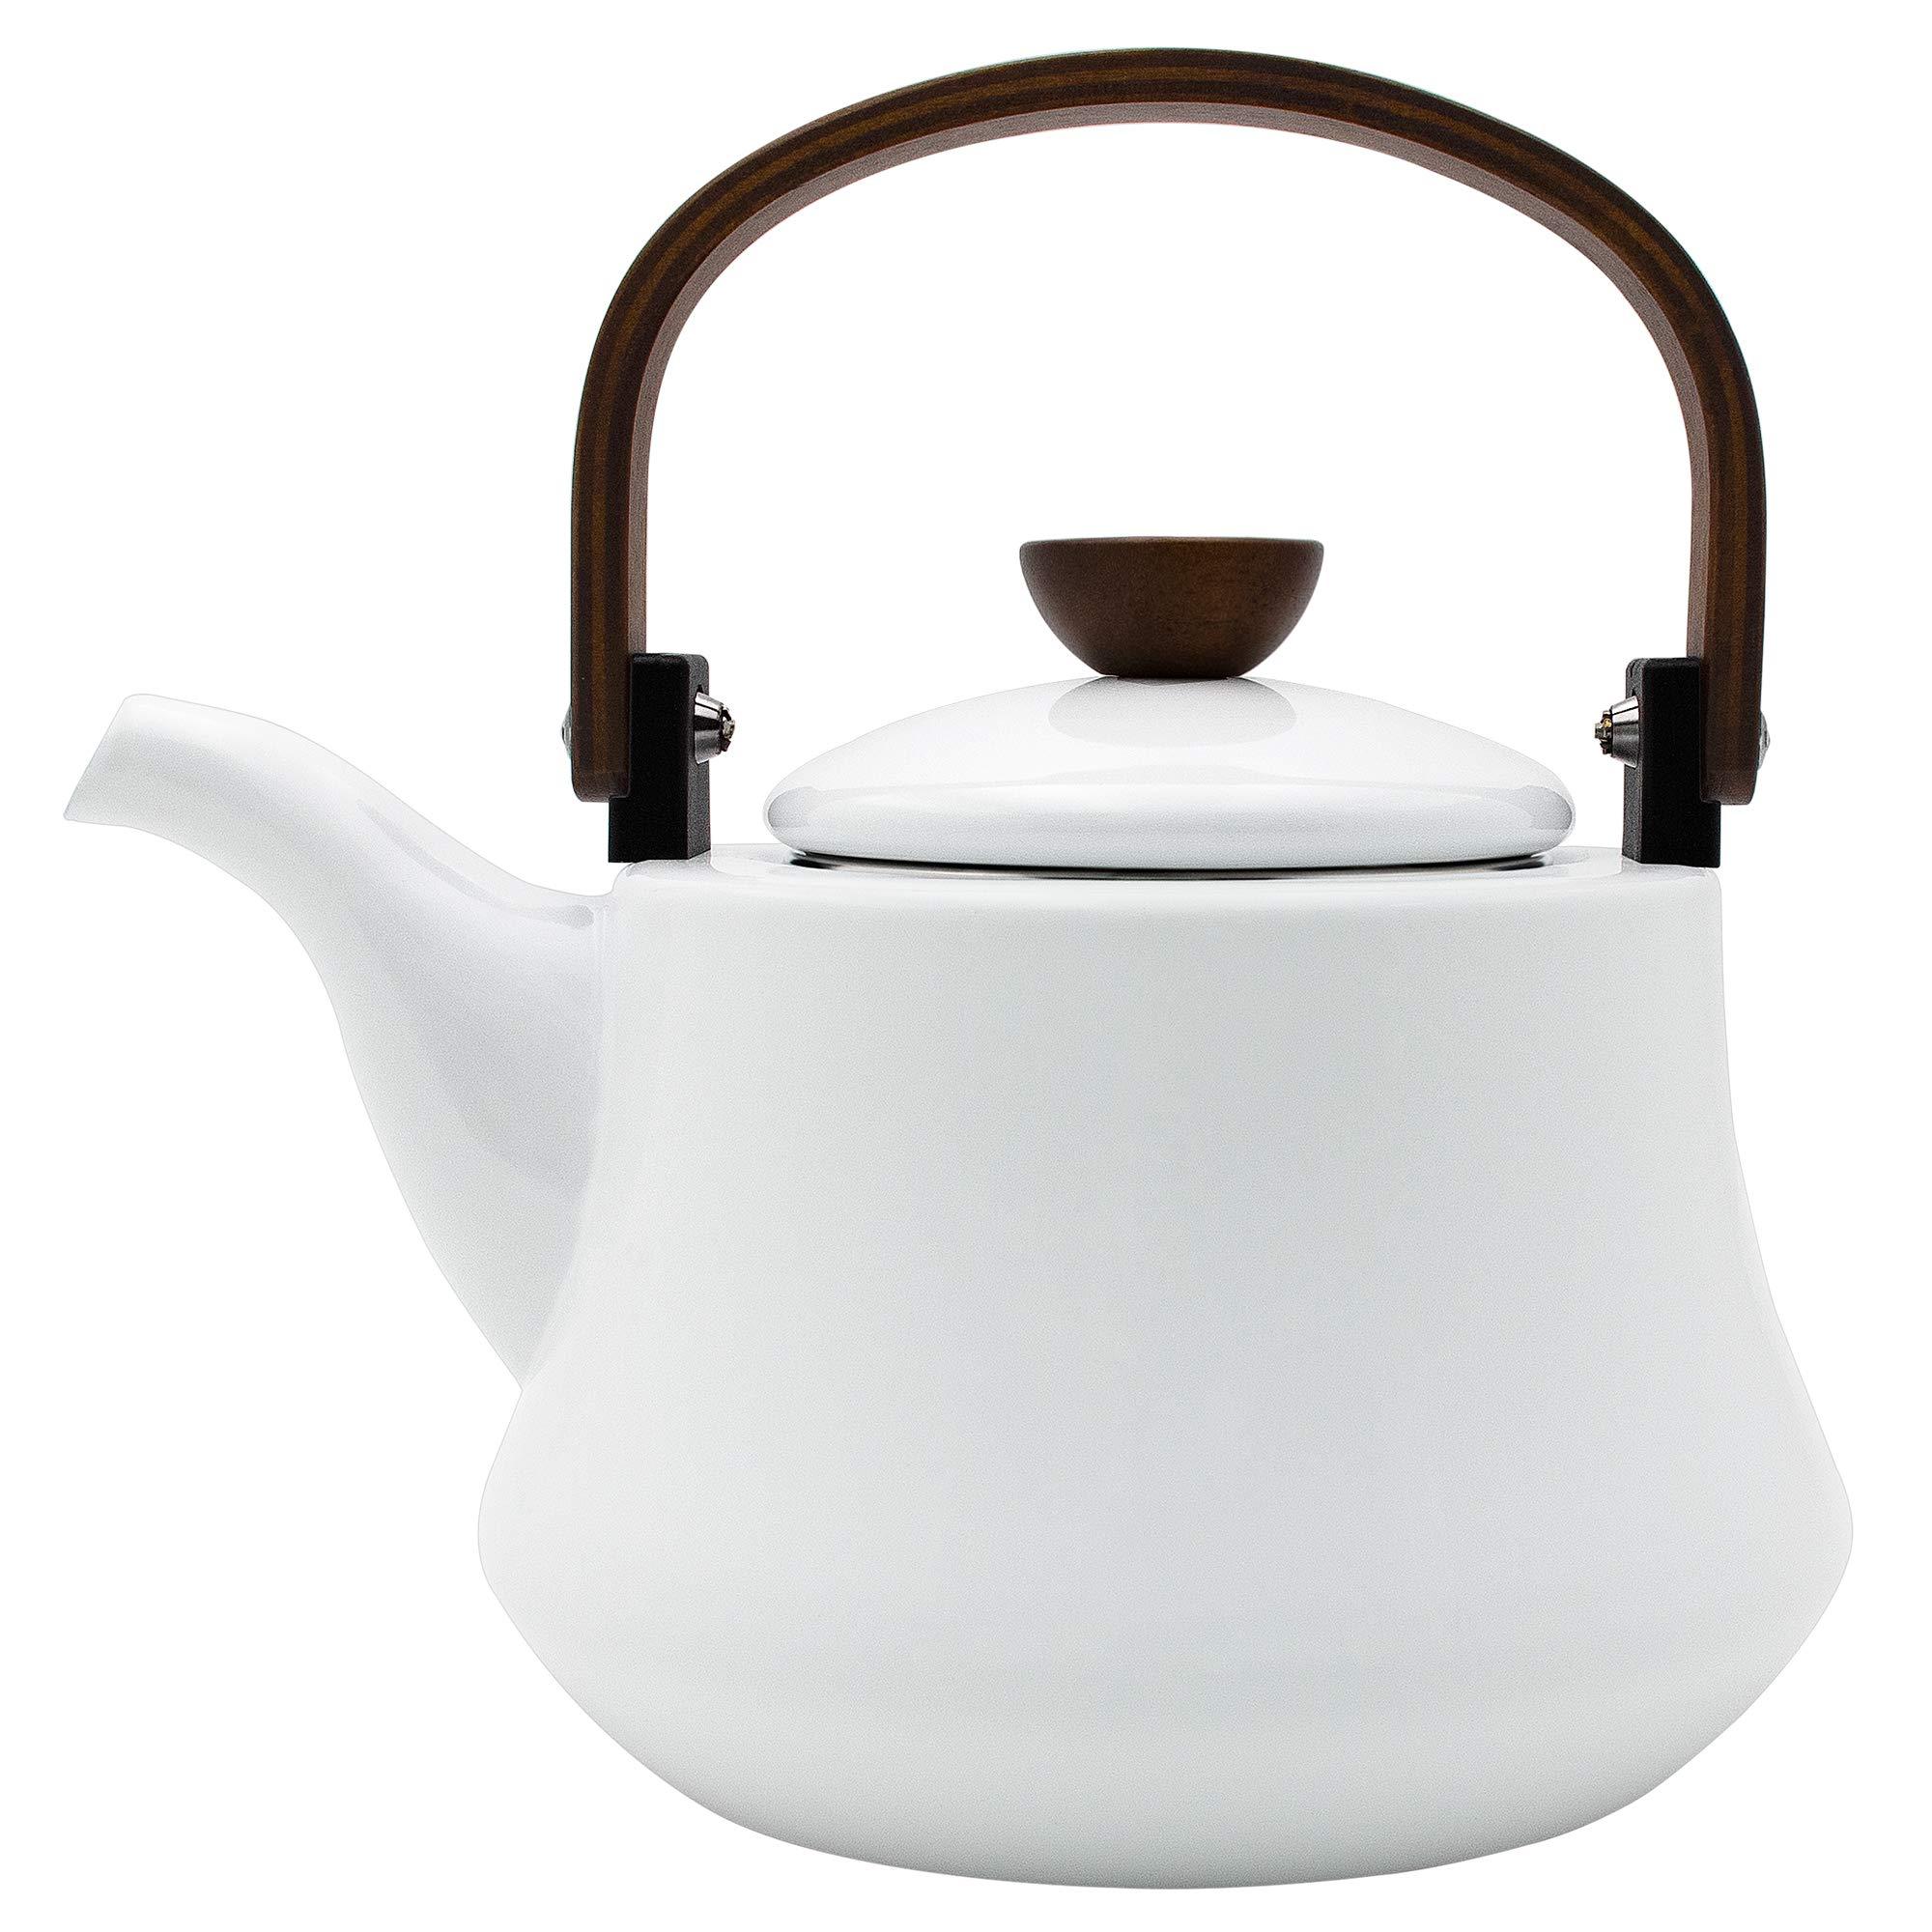 Enameled AIDEA Stovetop Induction Porcelain